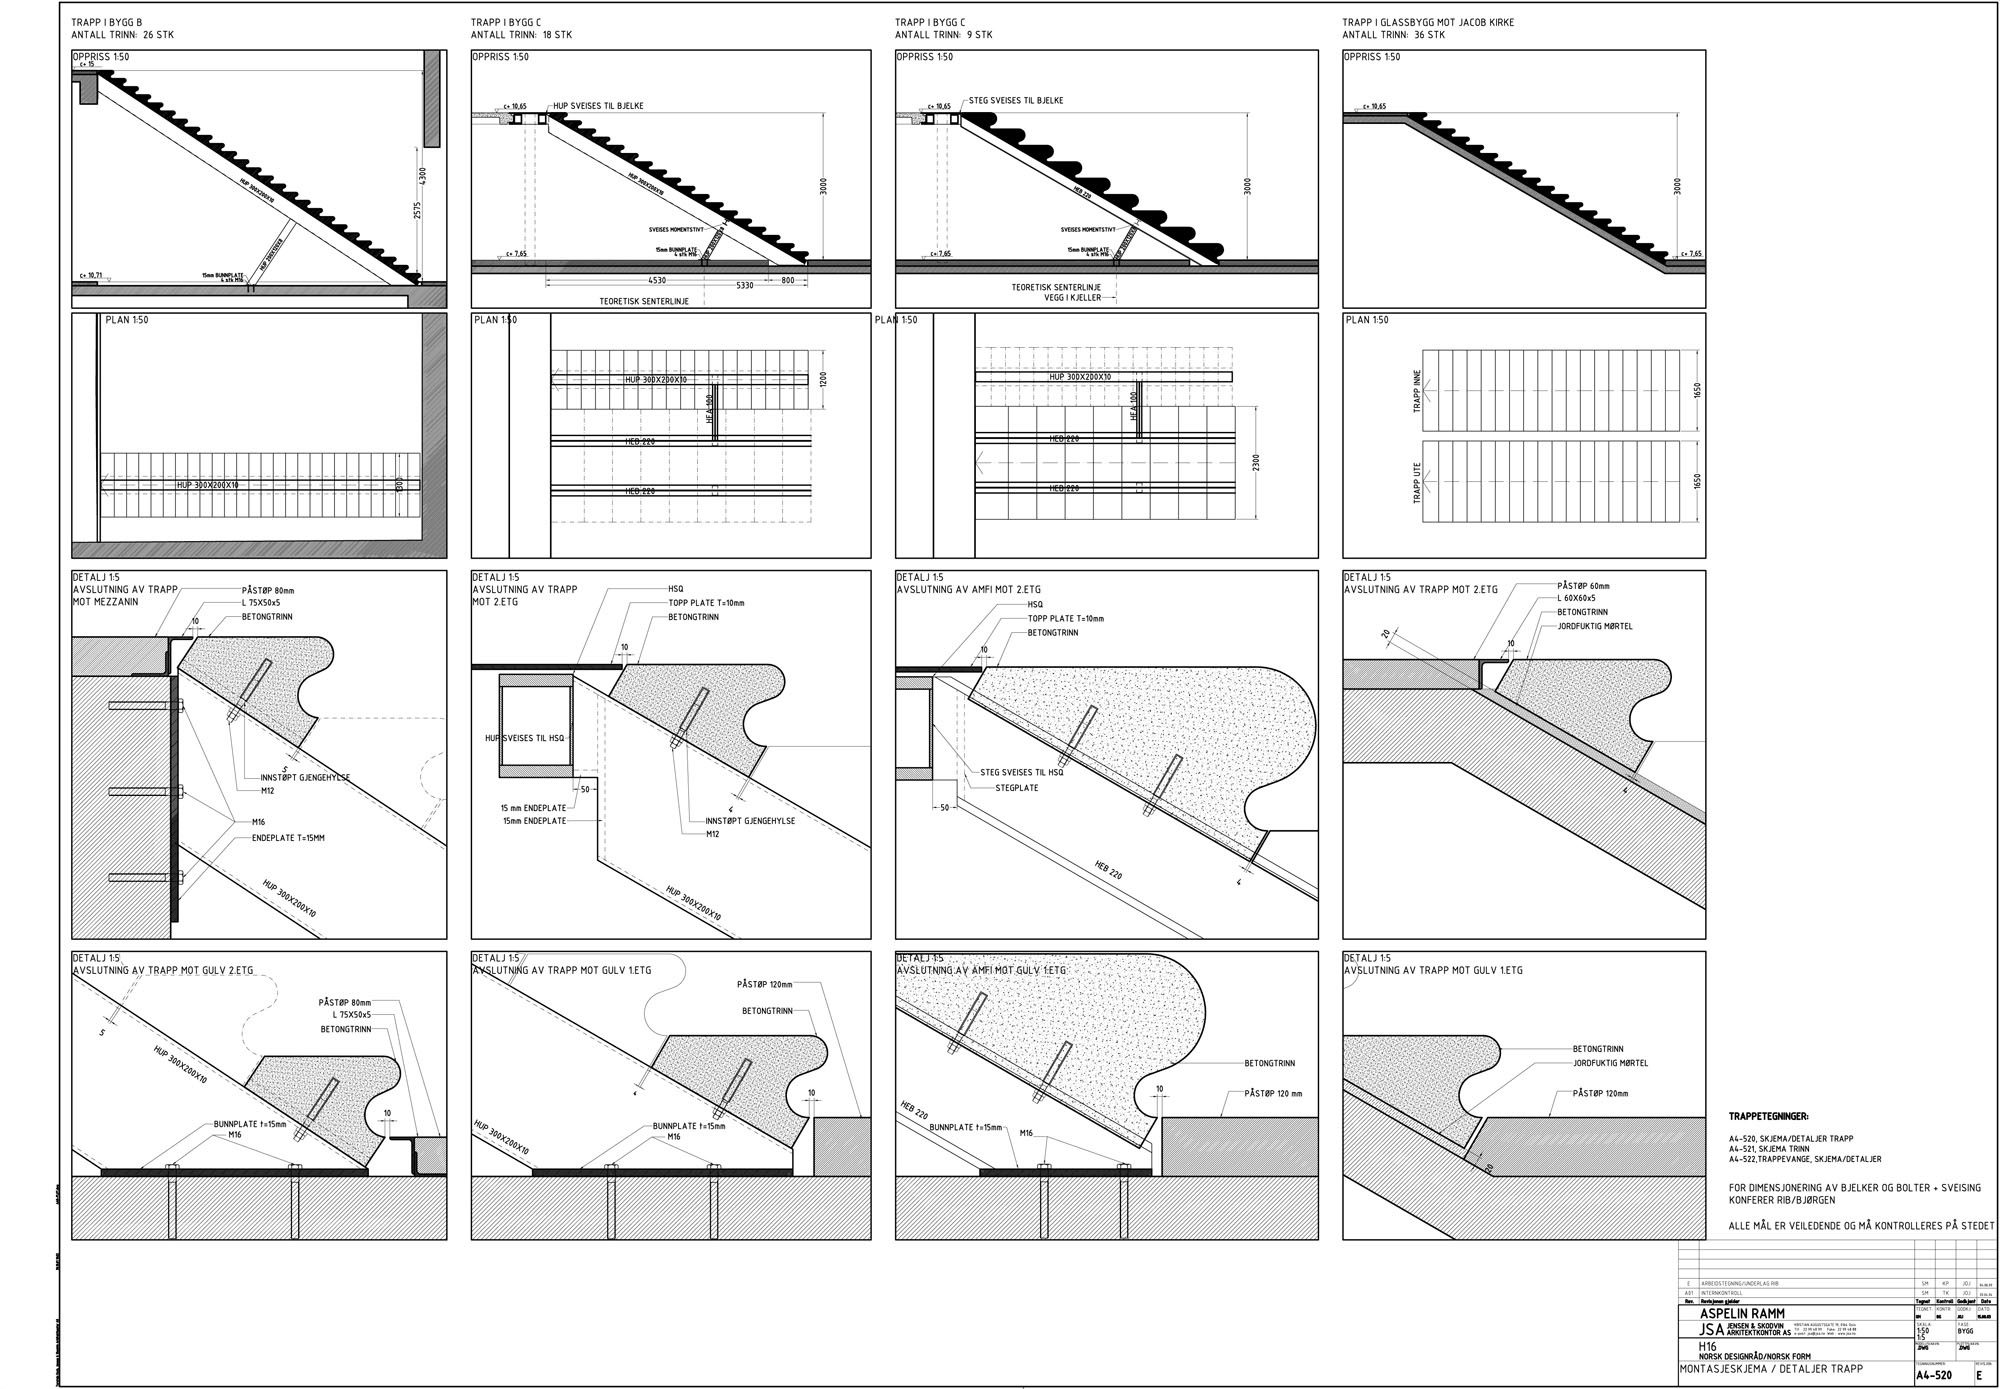 Construction Details: Construction Details Dwg